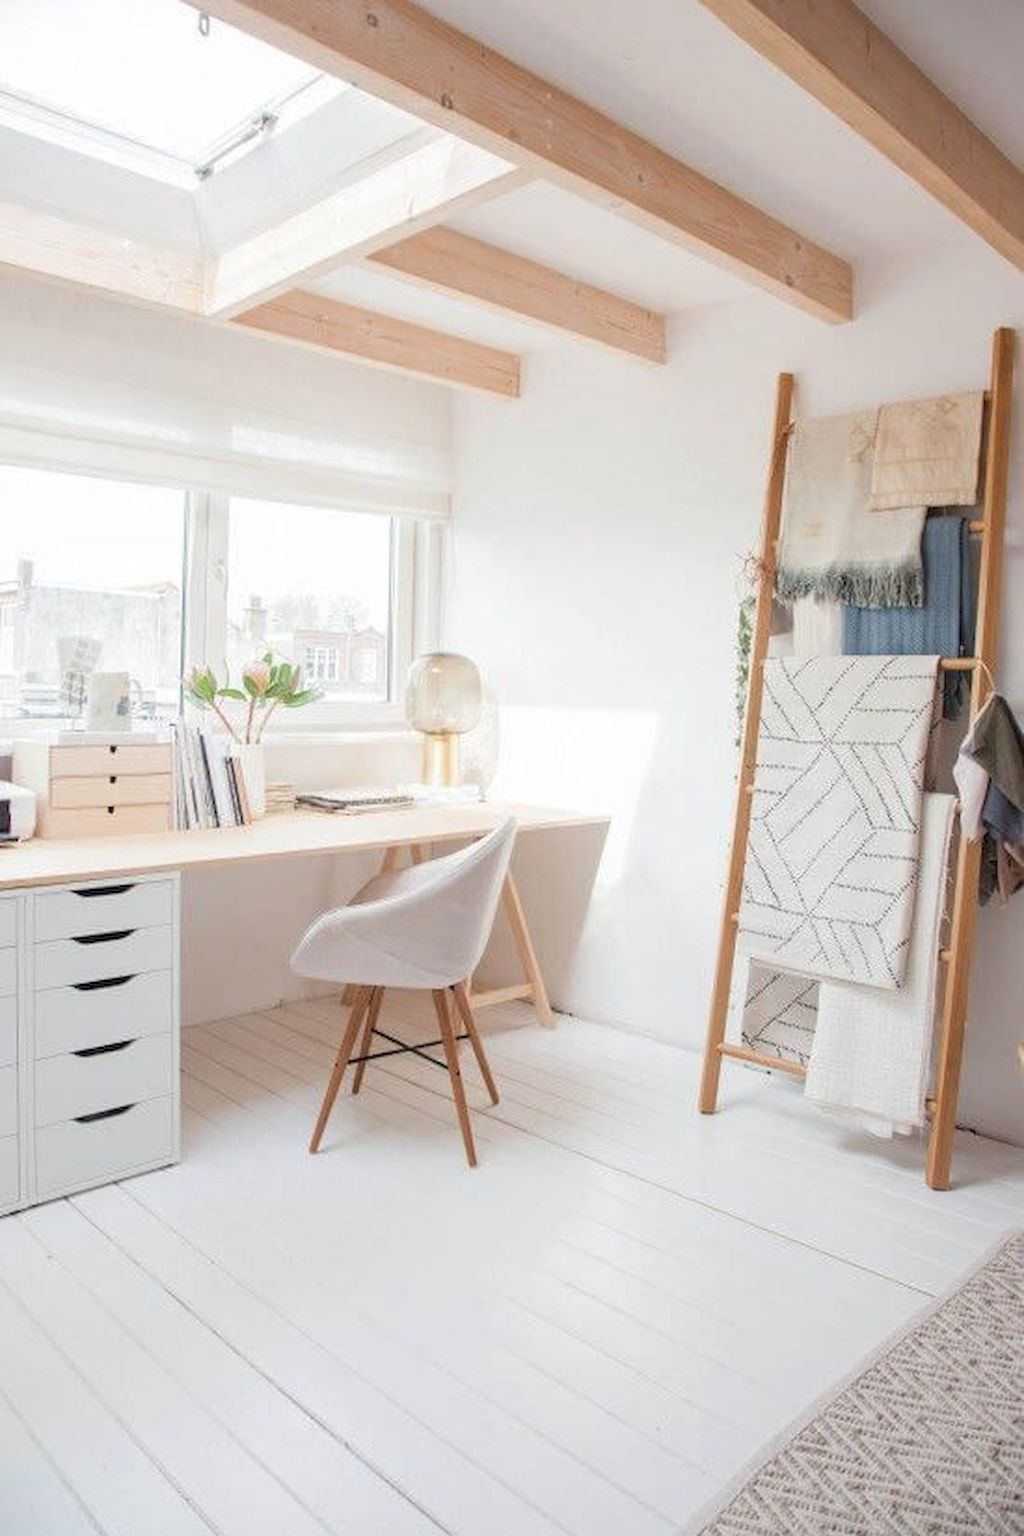 Adorable 40 Minimalist Home Decor Ideas Https://rusticroom.co/1037/40  Minimalist Home Decor Ideas